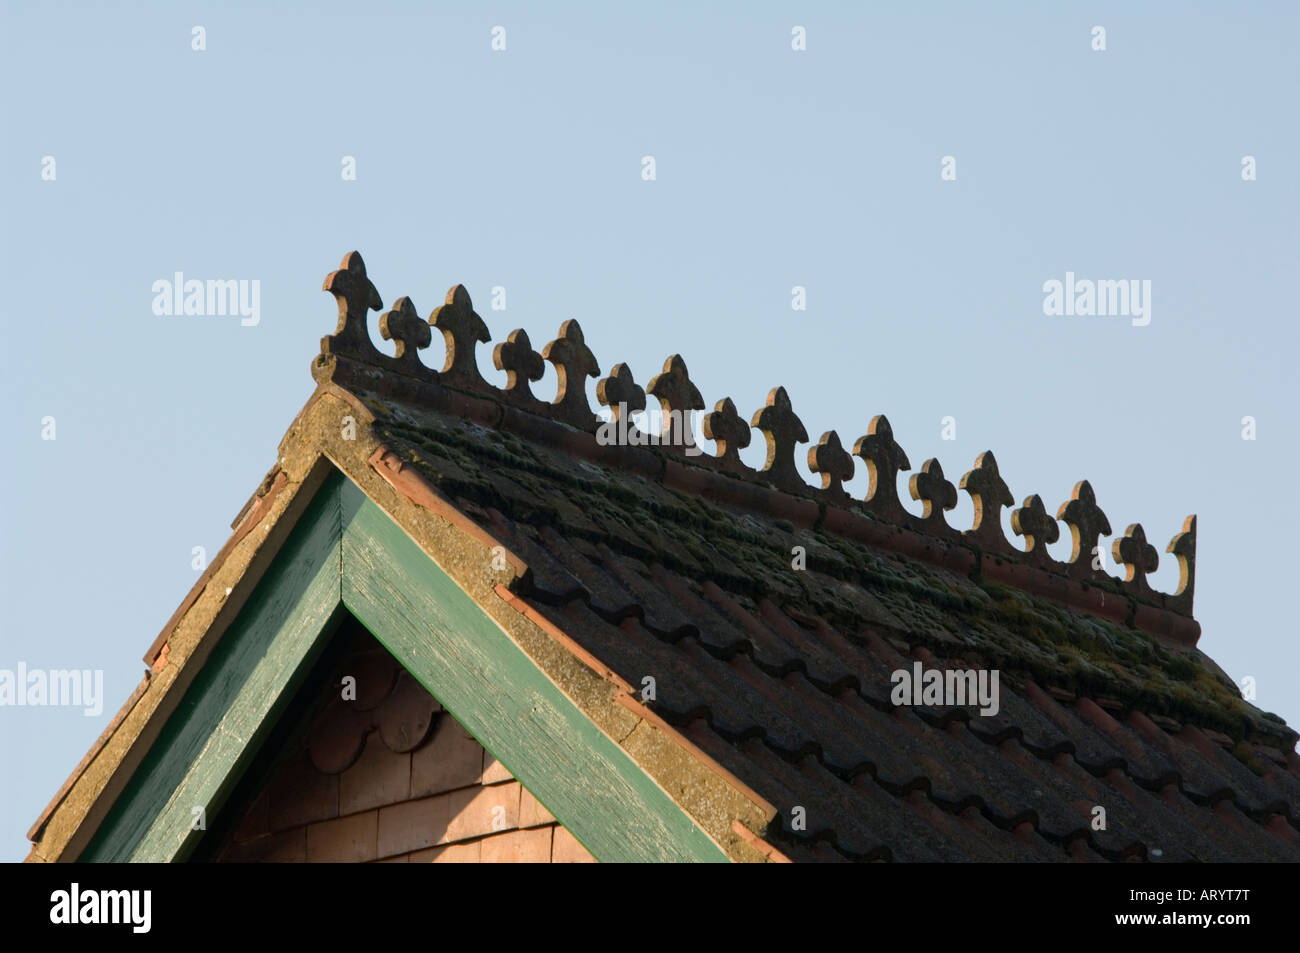 Rooftop Decorative Tiles Albury Surrey UK - Stock Image